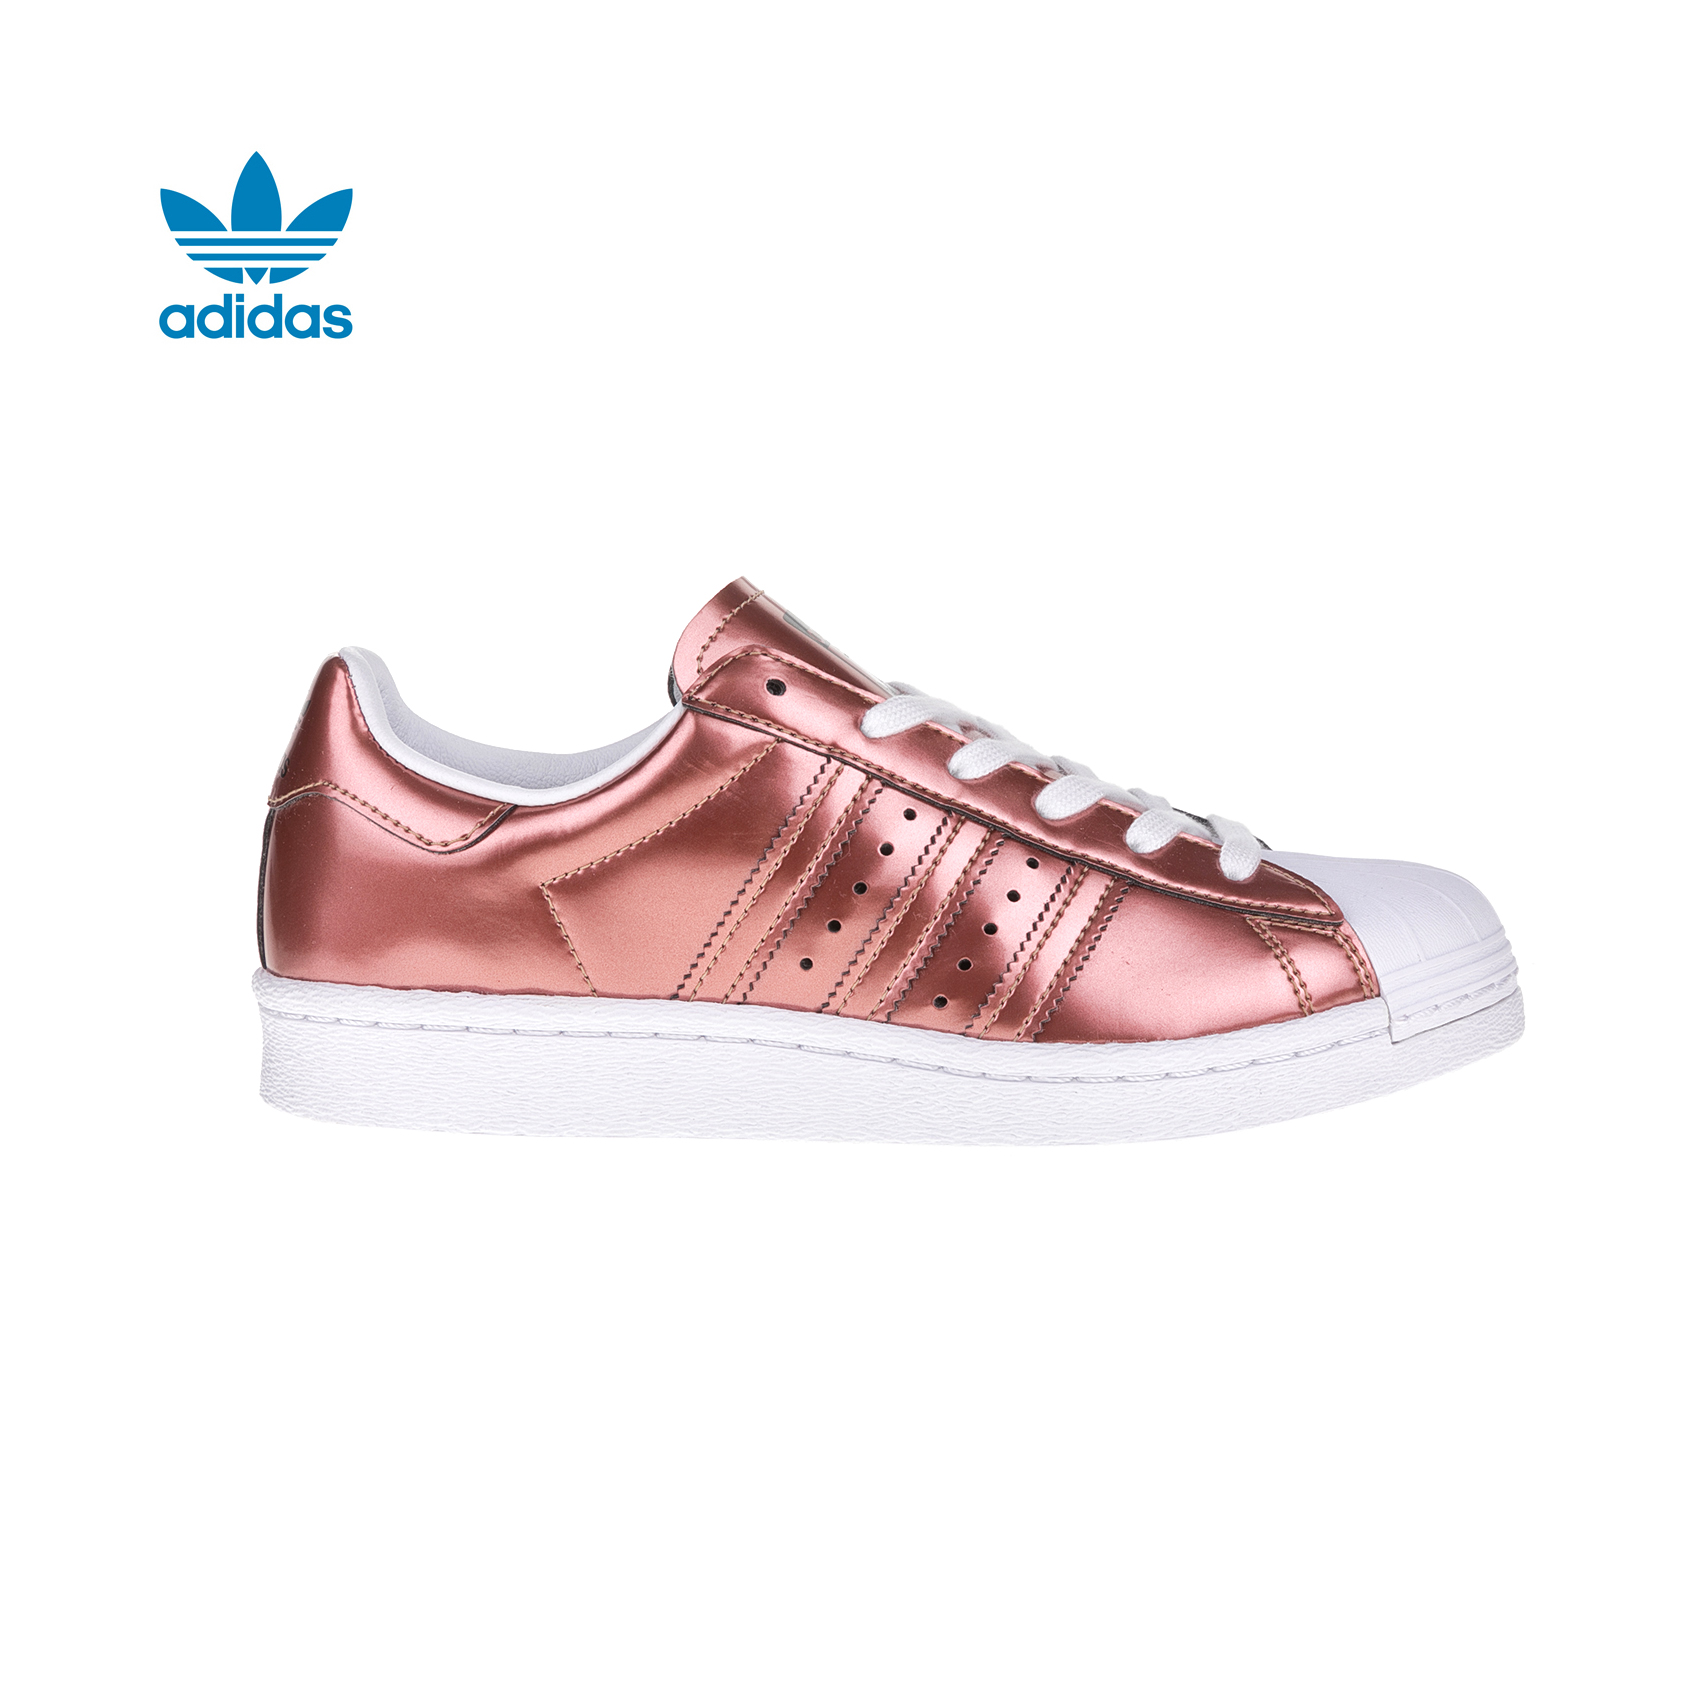 59d46a8ff29 adidas Originals - Γυναικεία sneakers adidas SUPERSTAR μεταλλικά | e ...